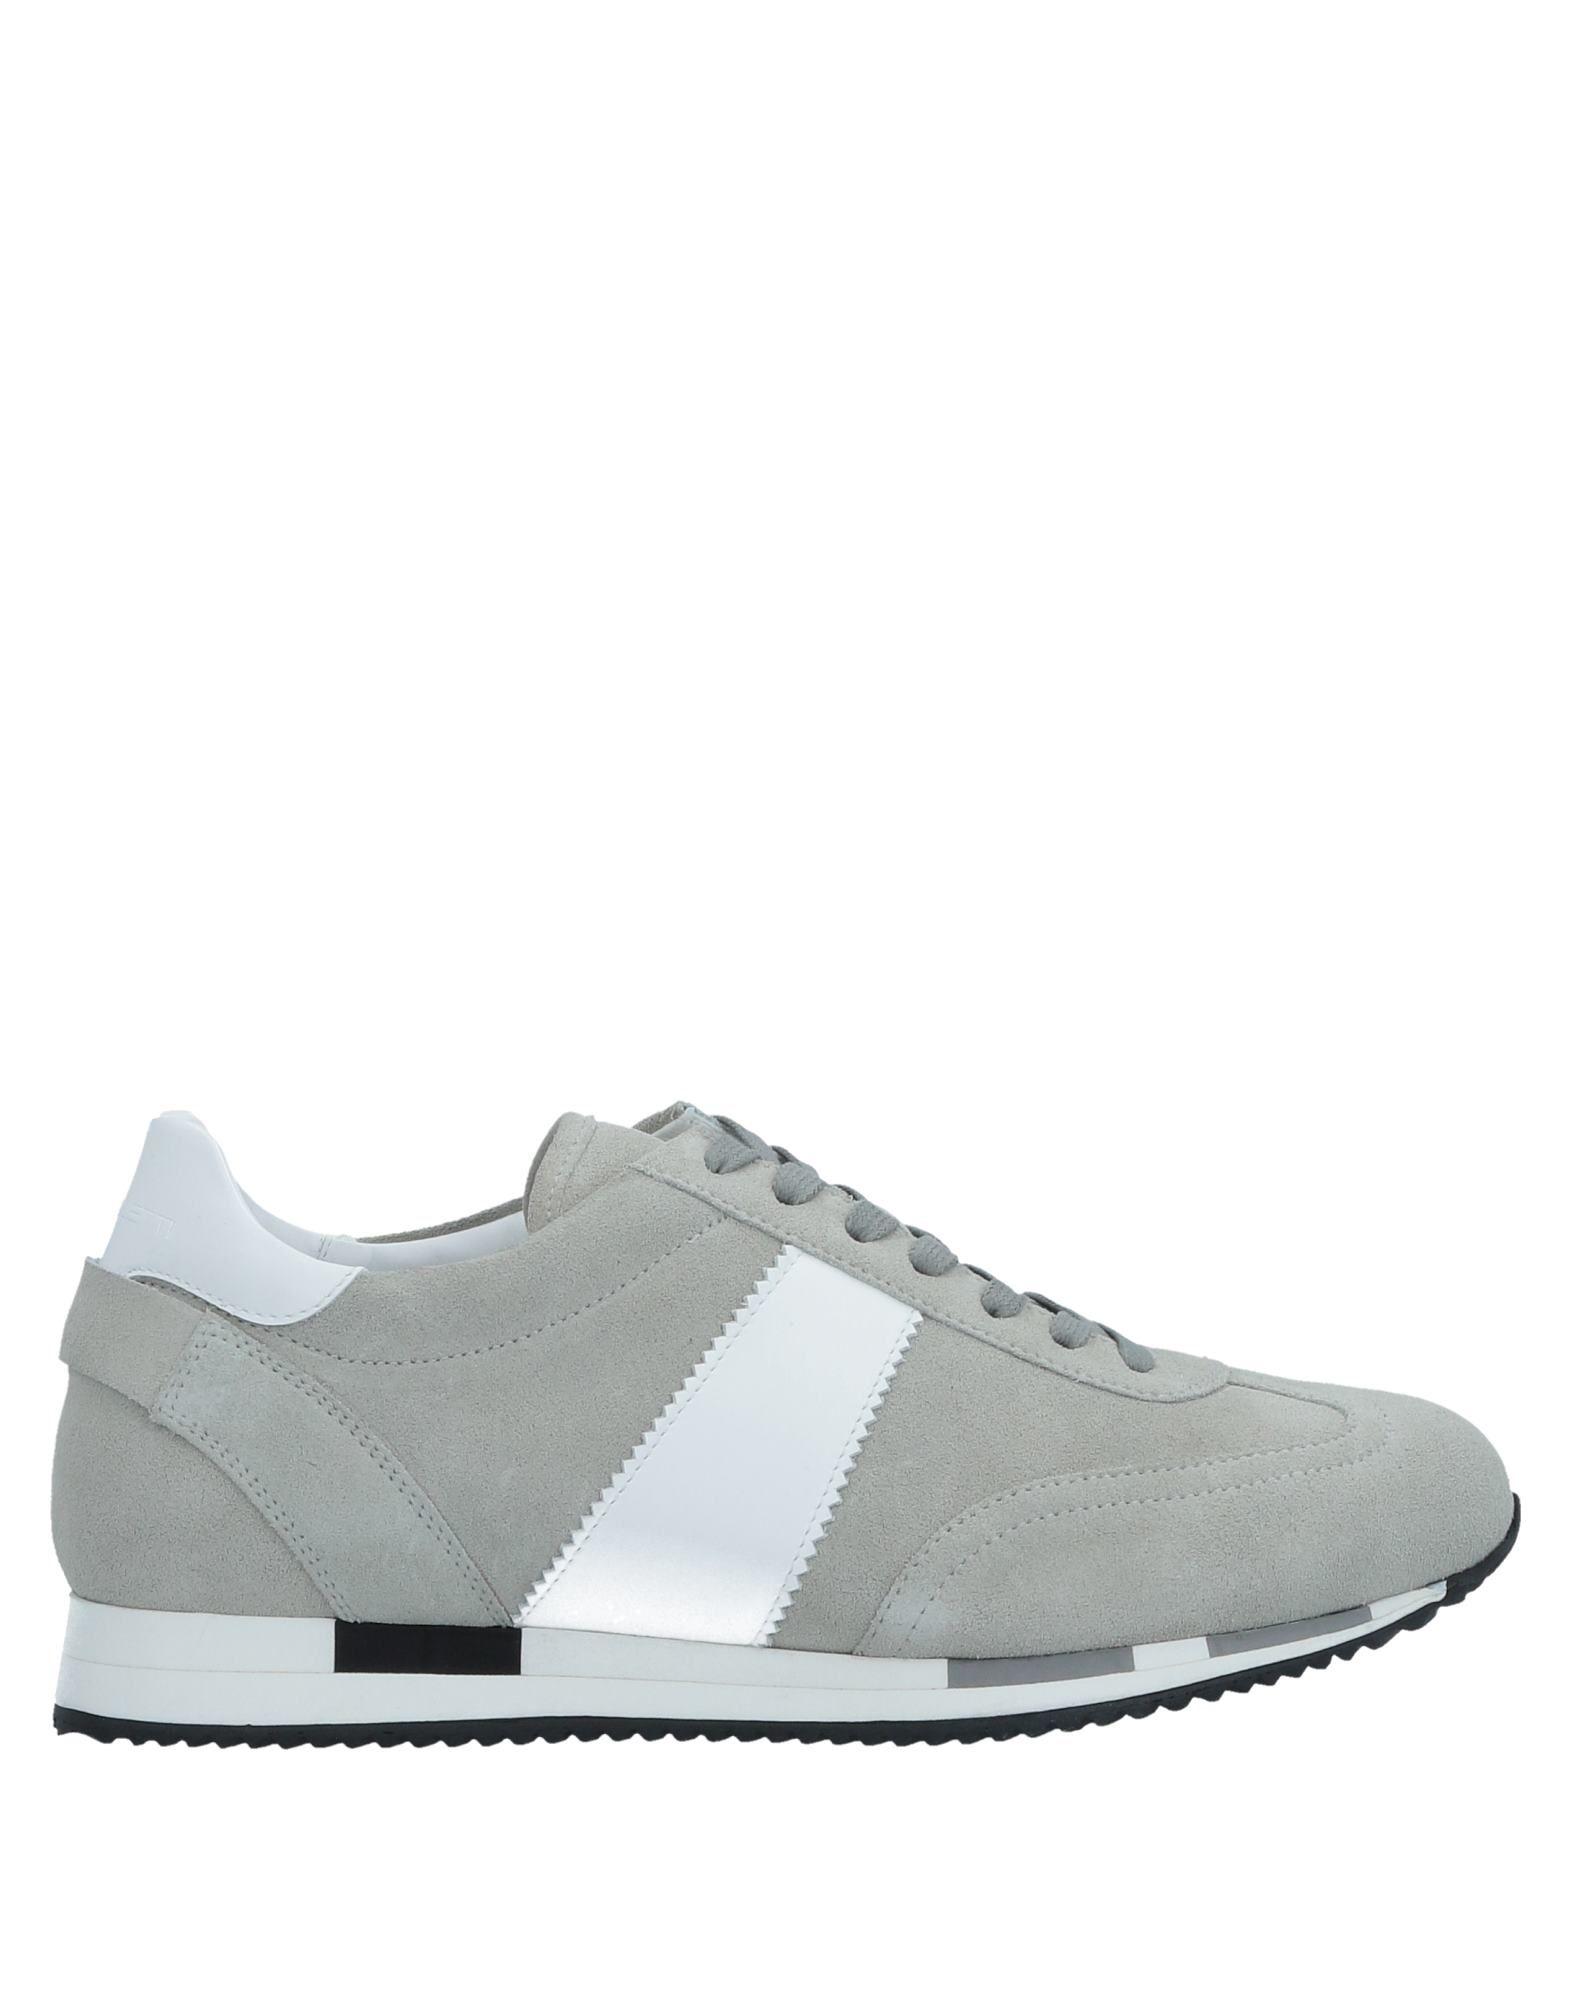 CAPPELLETTI Sneakers in Light Grey